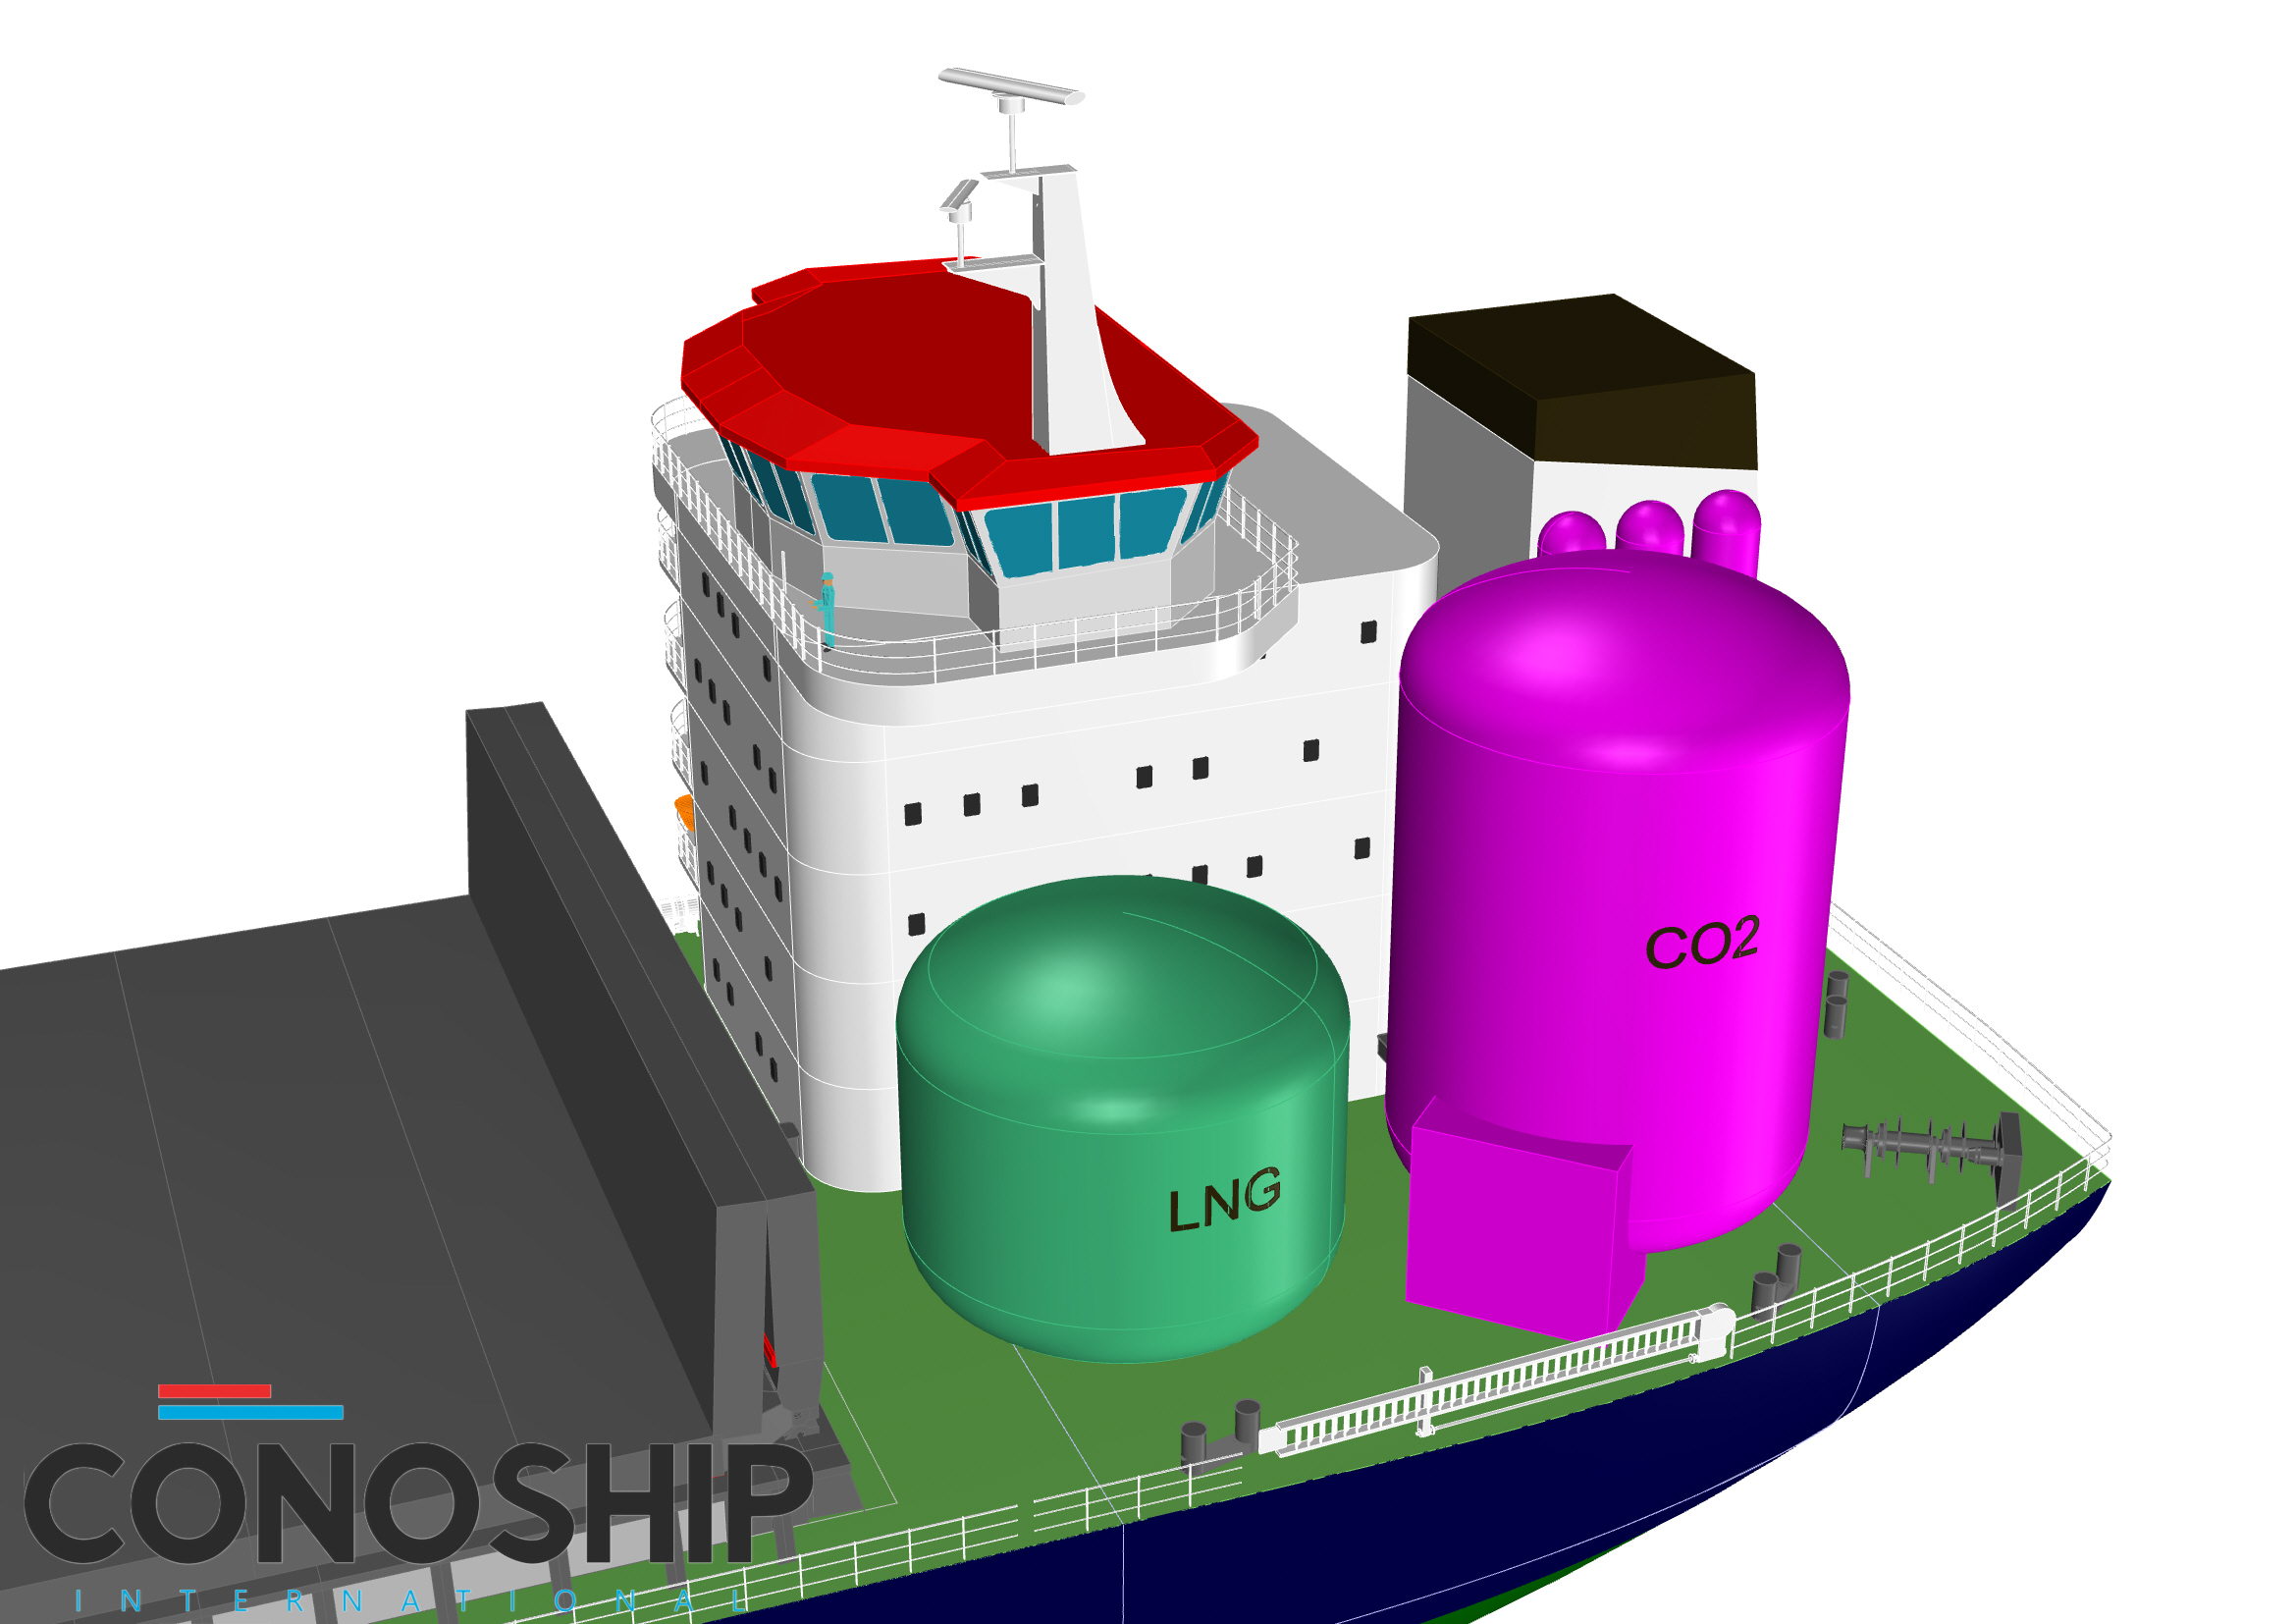 Conoship: Marine carbon capture future-proofs LNG-fuelled vessels